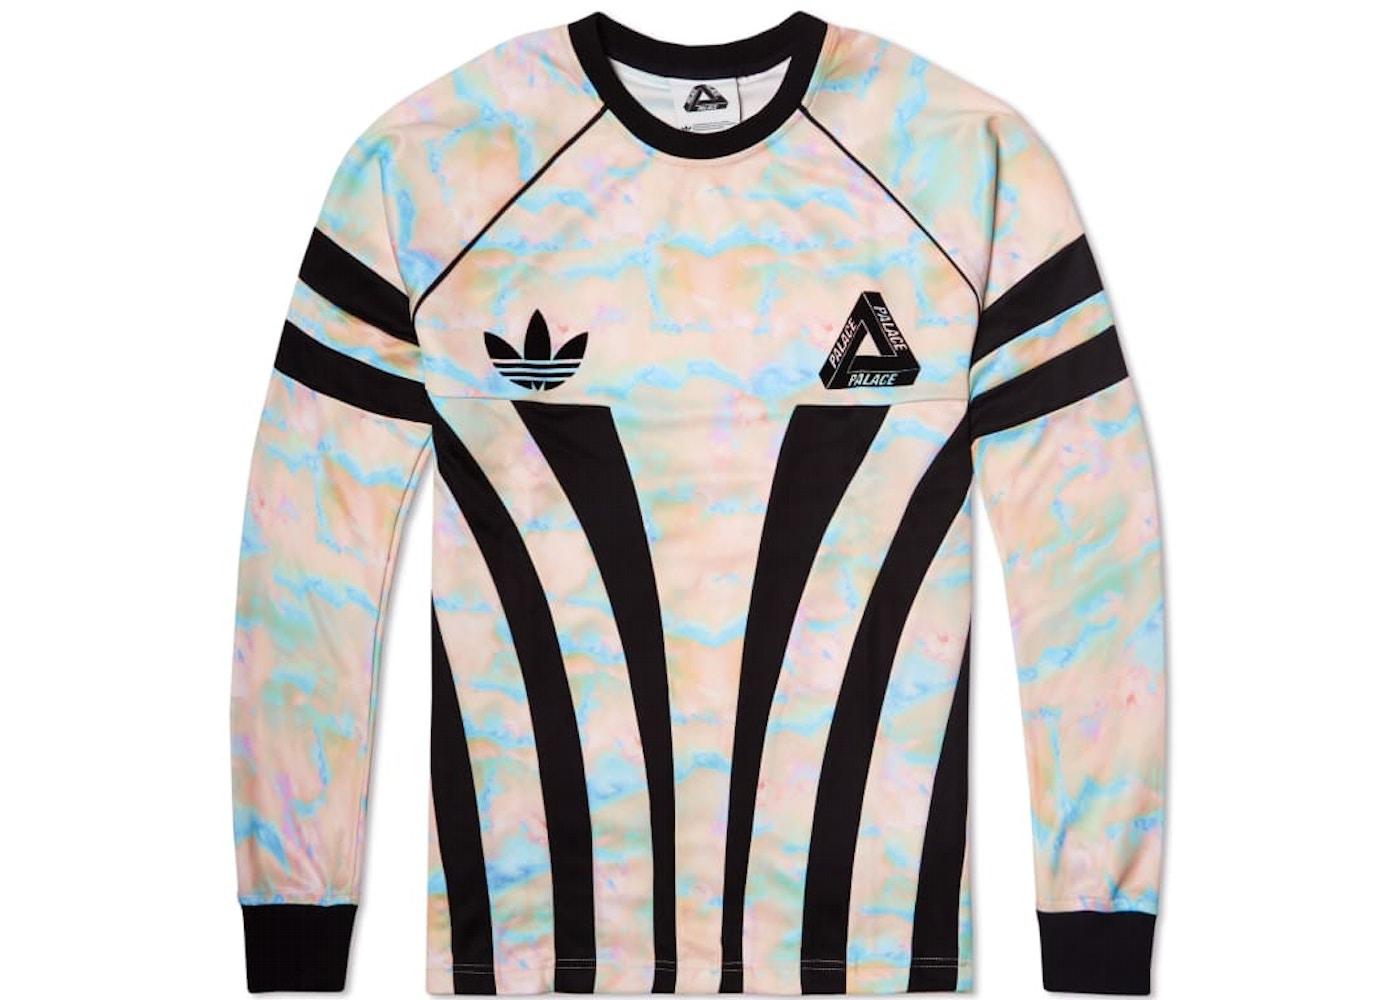 c5c4e9c9 Palace Adidas Longsleeve Graphic Goalie Top Multi/Black - FW15